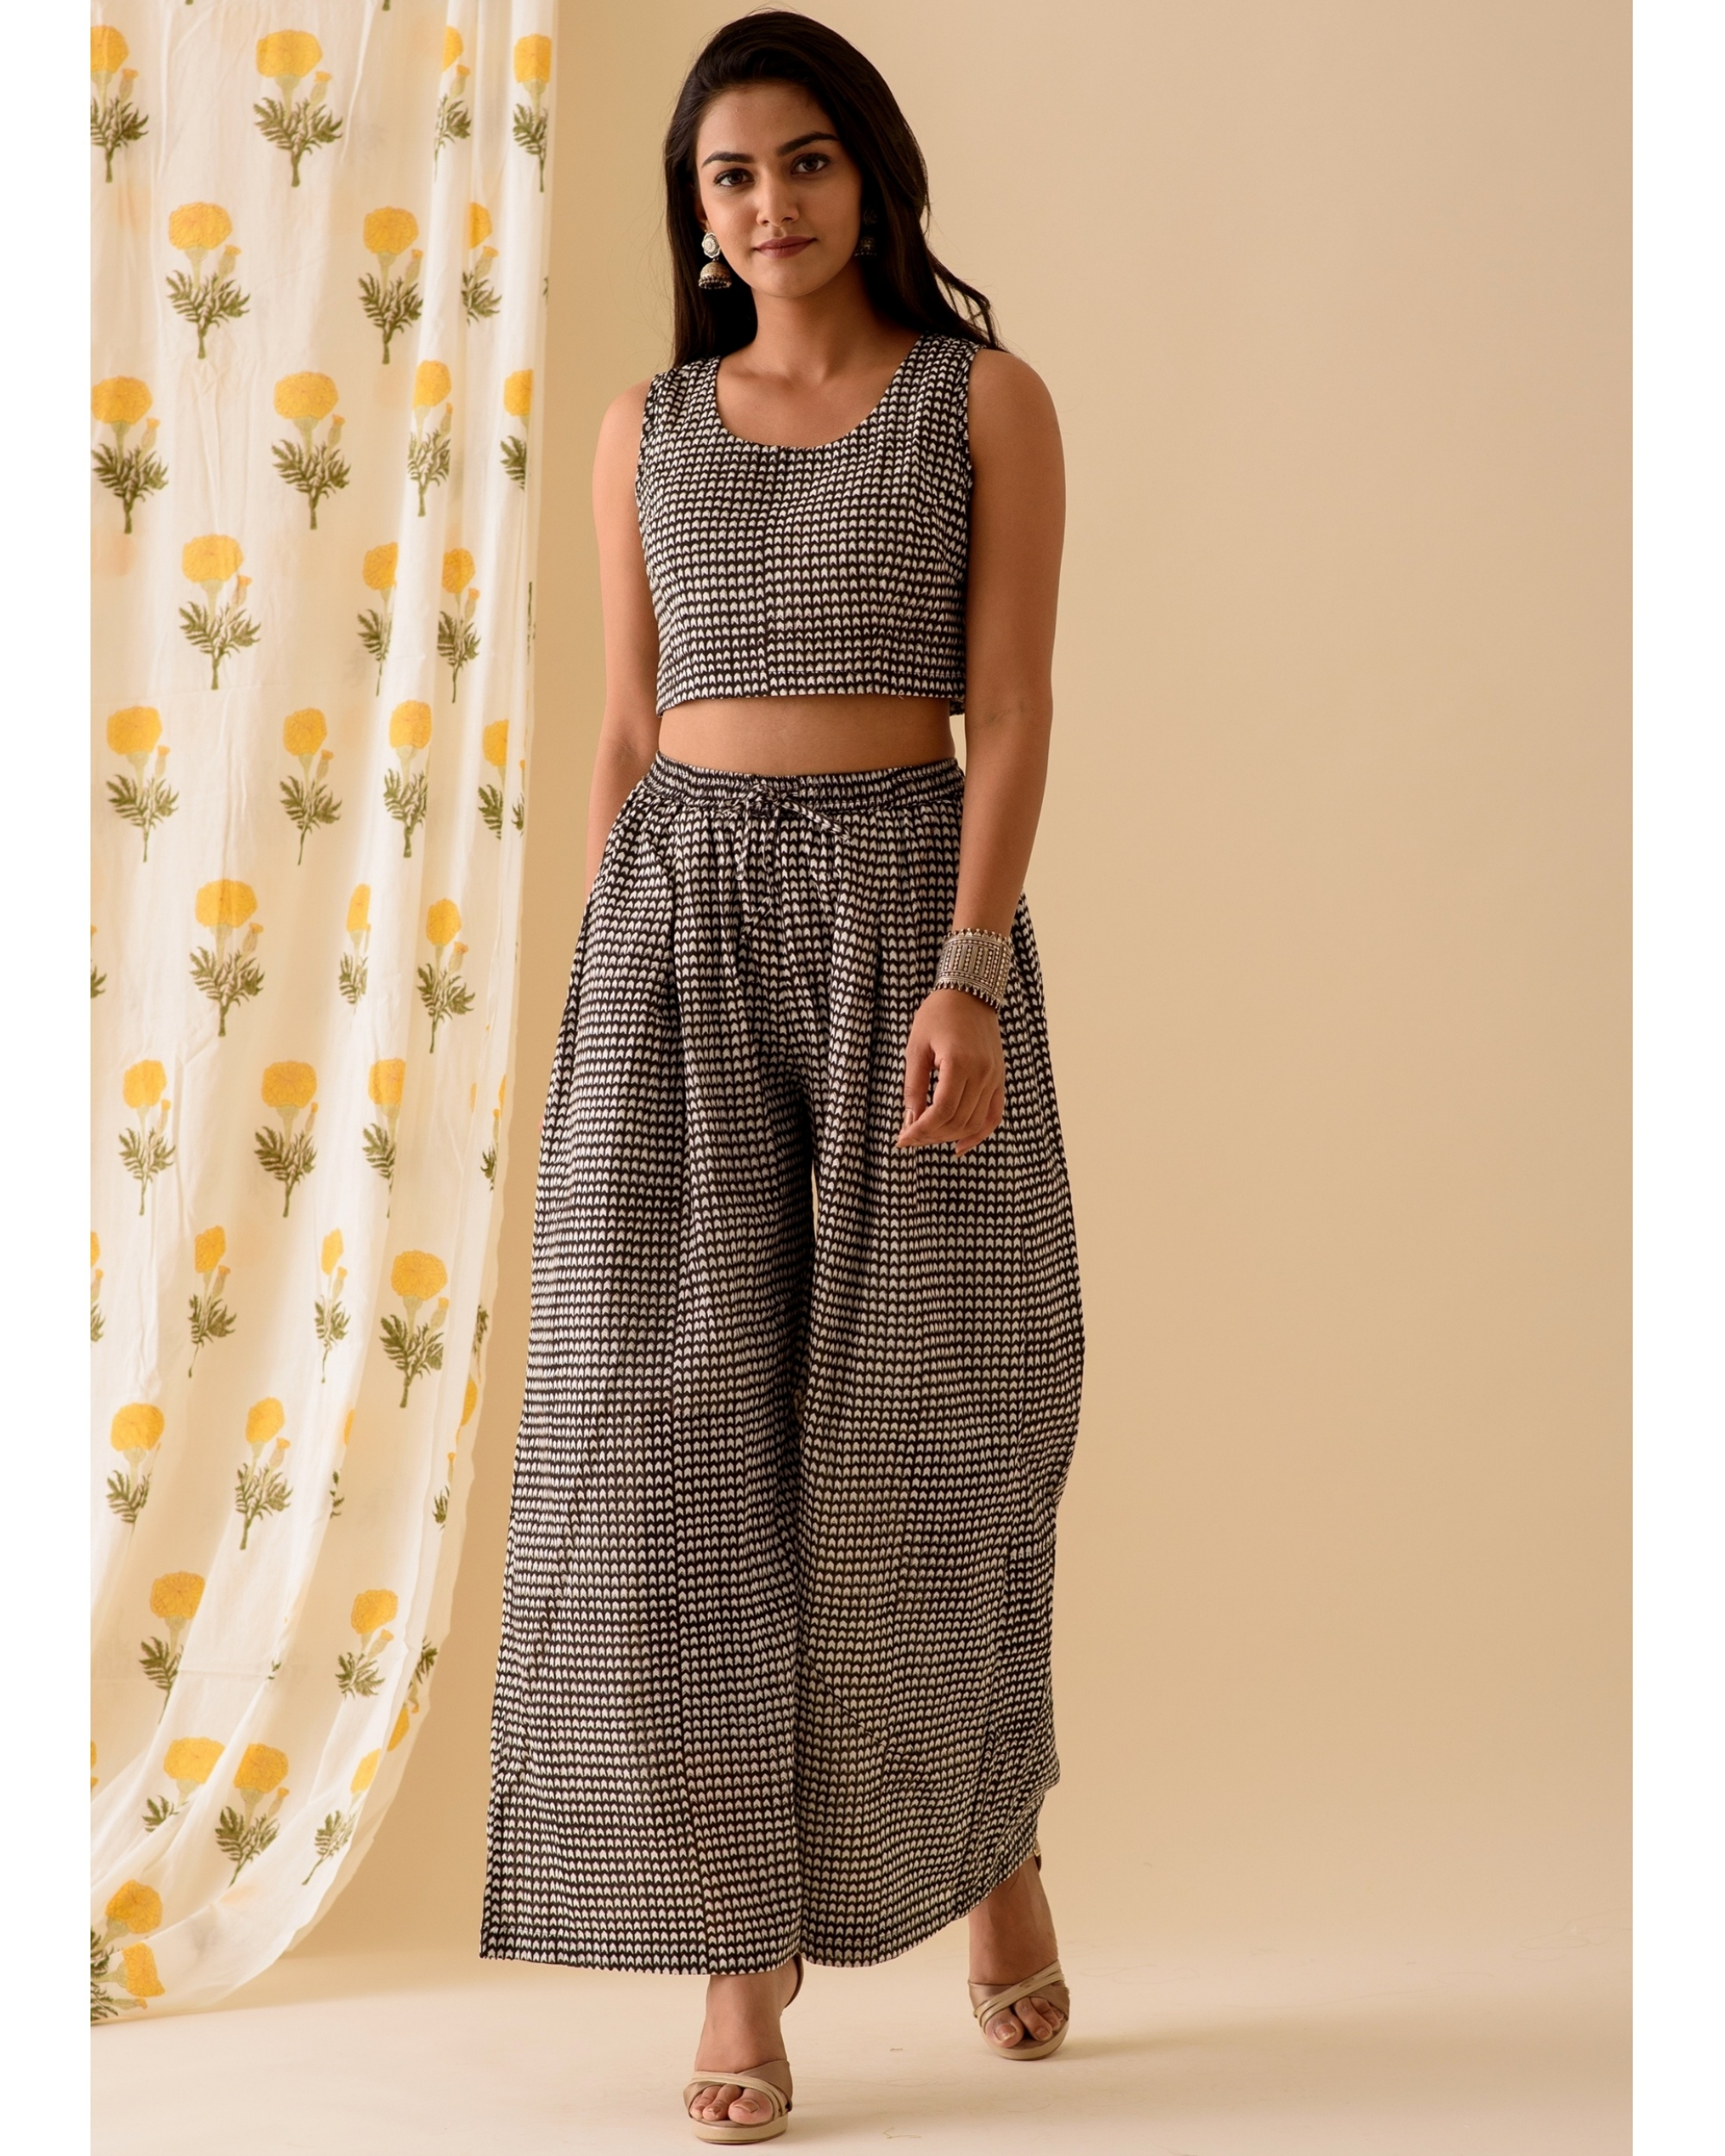 Black block printed crop top and pants-set of two